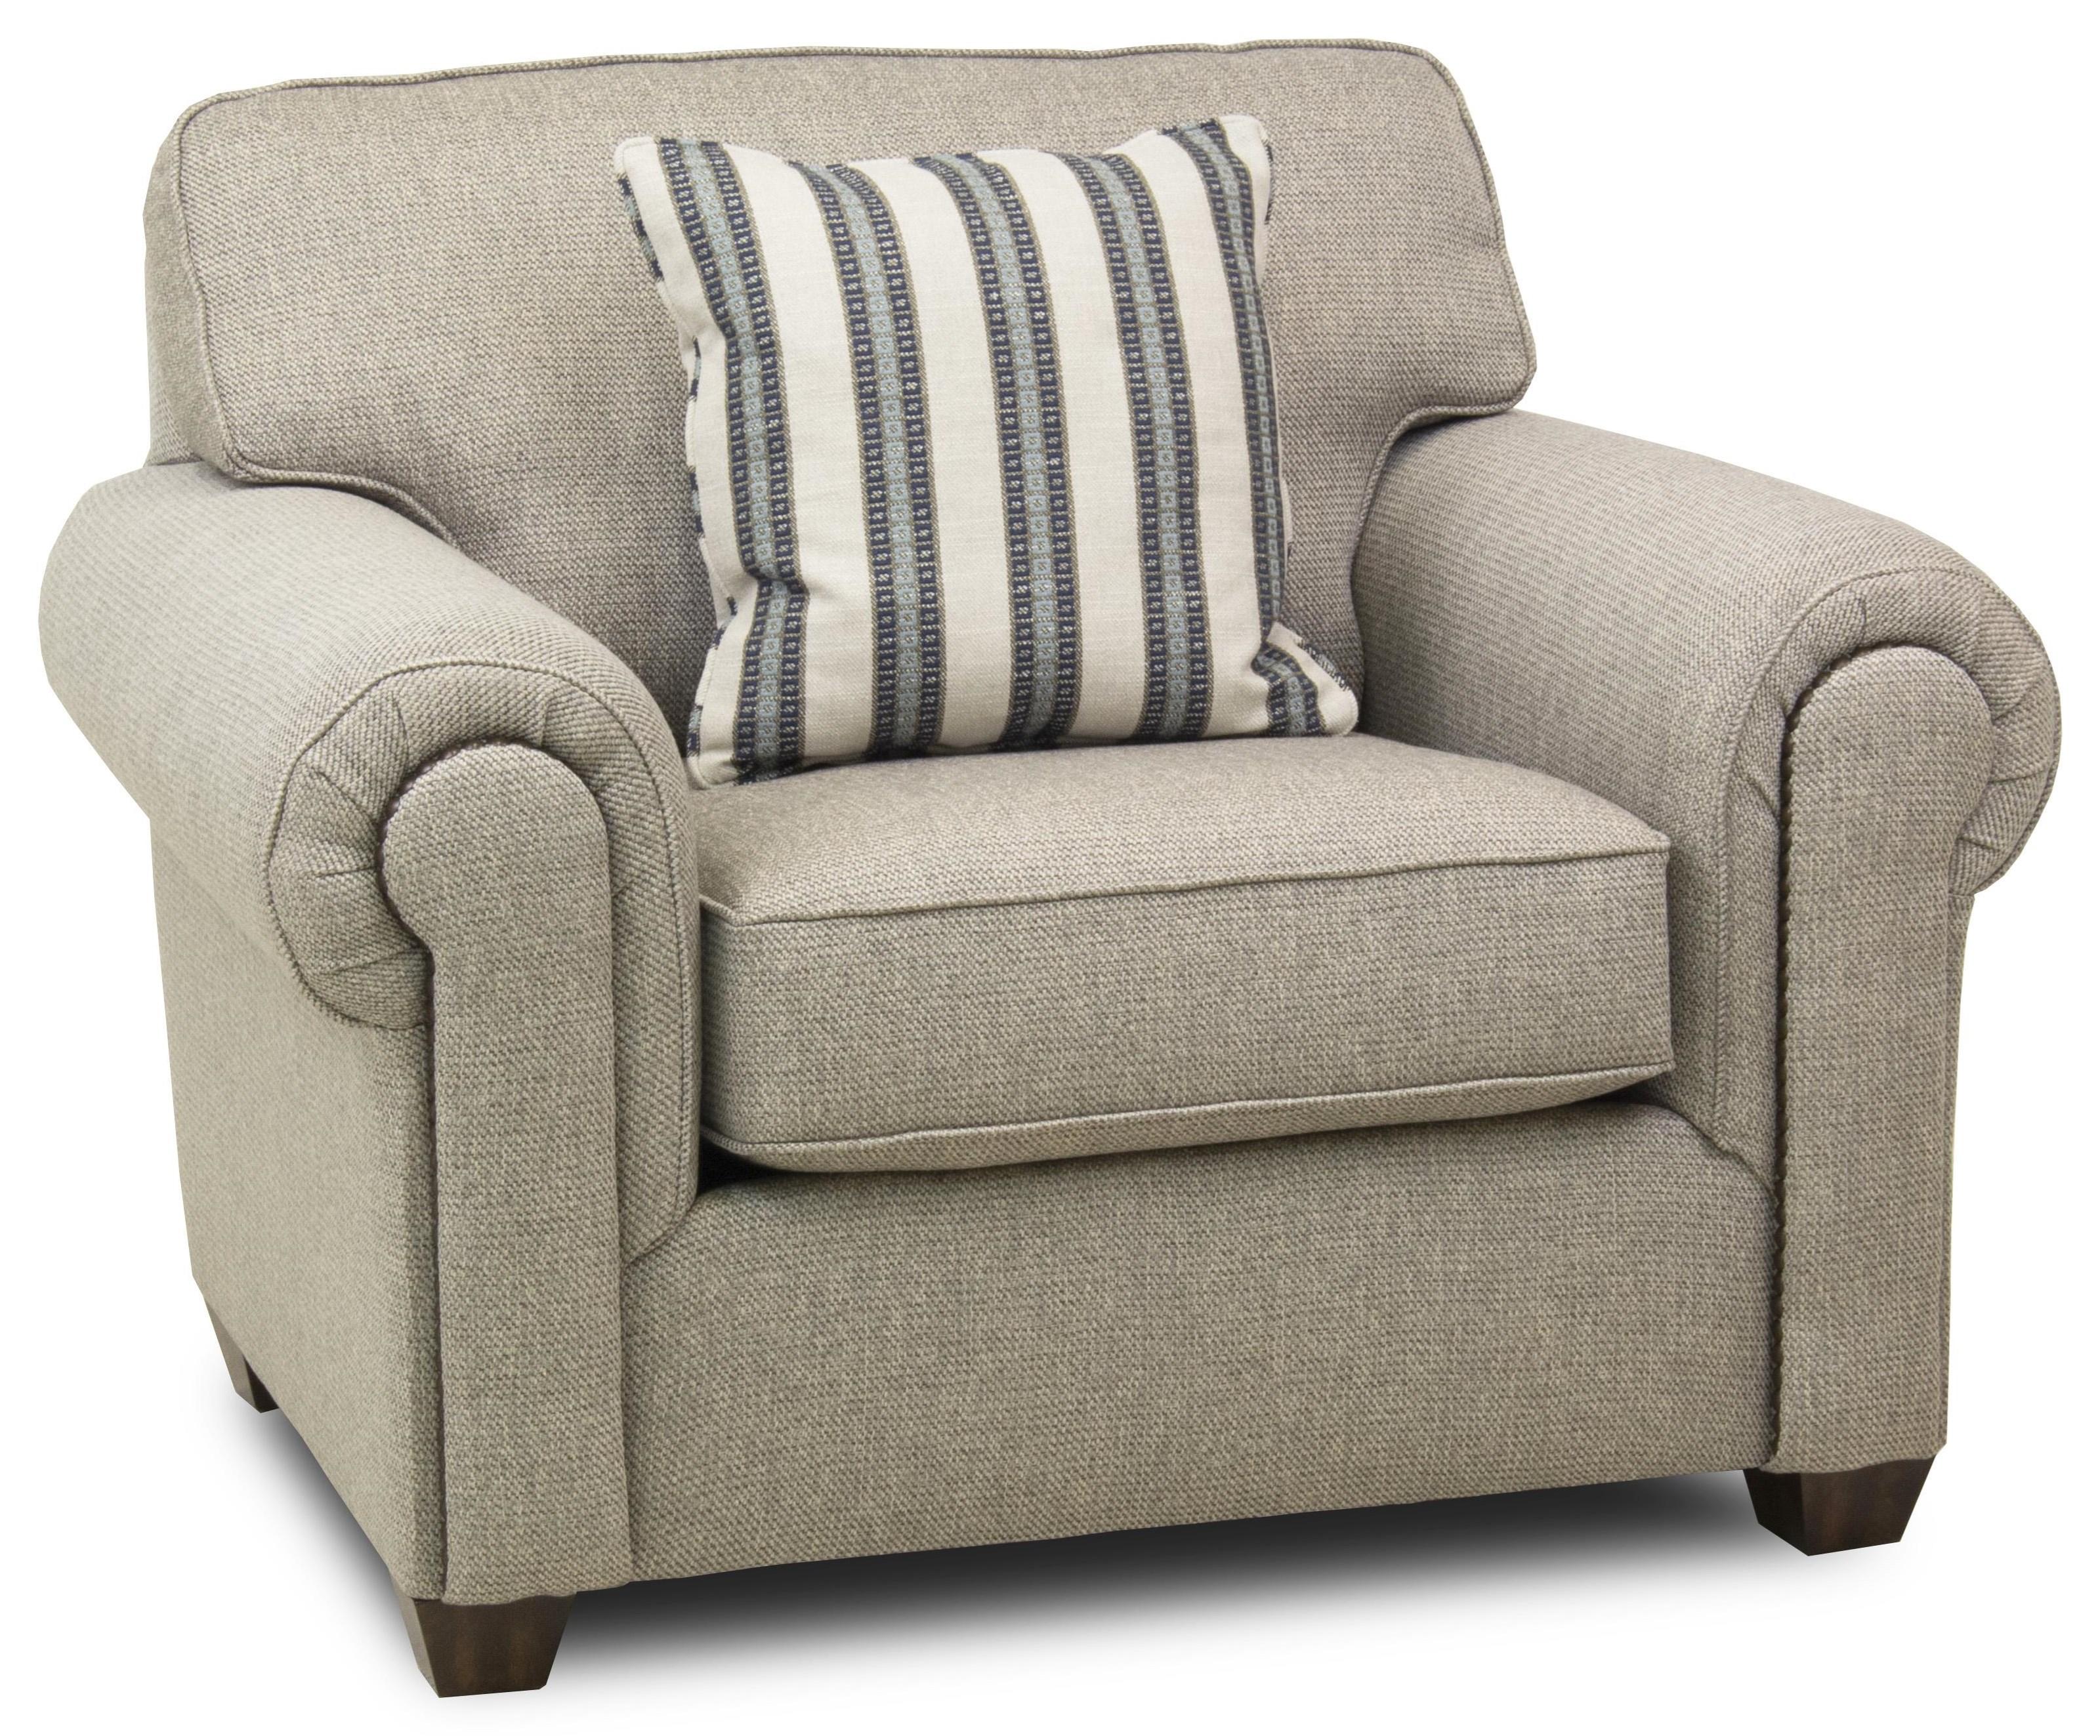 Carson Chair  by Flexsteel at Ruby Gordon Home